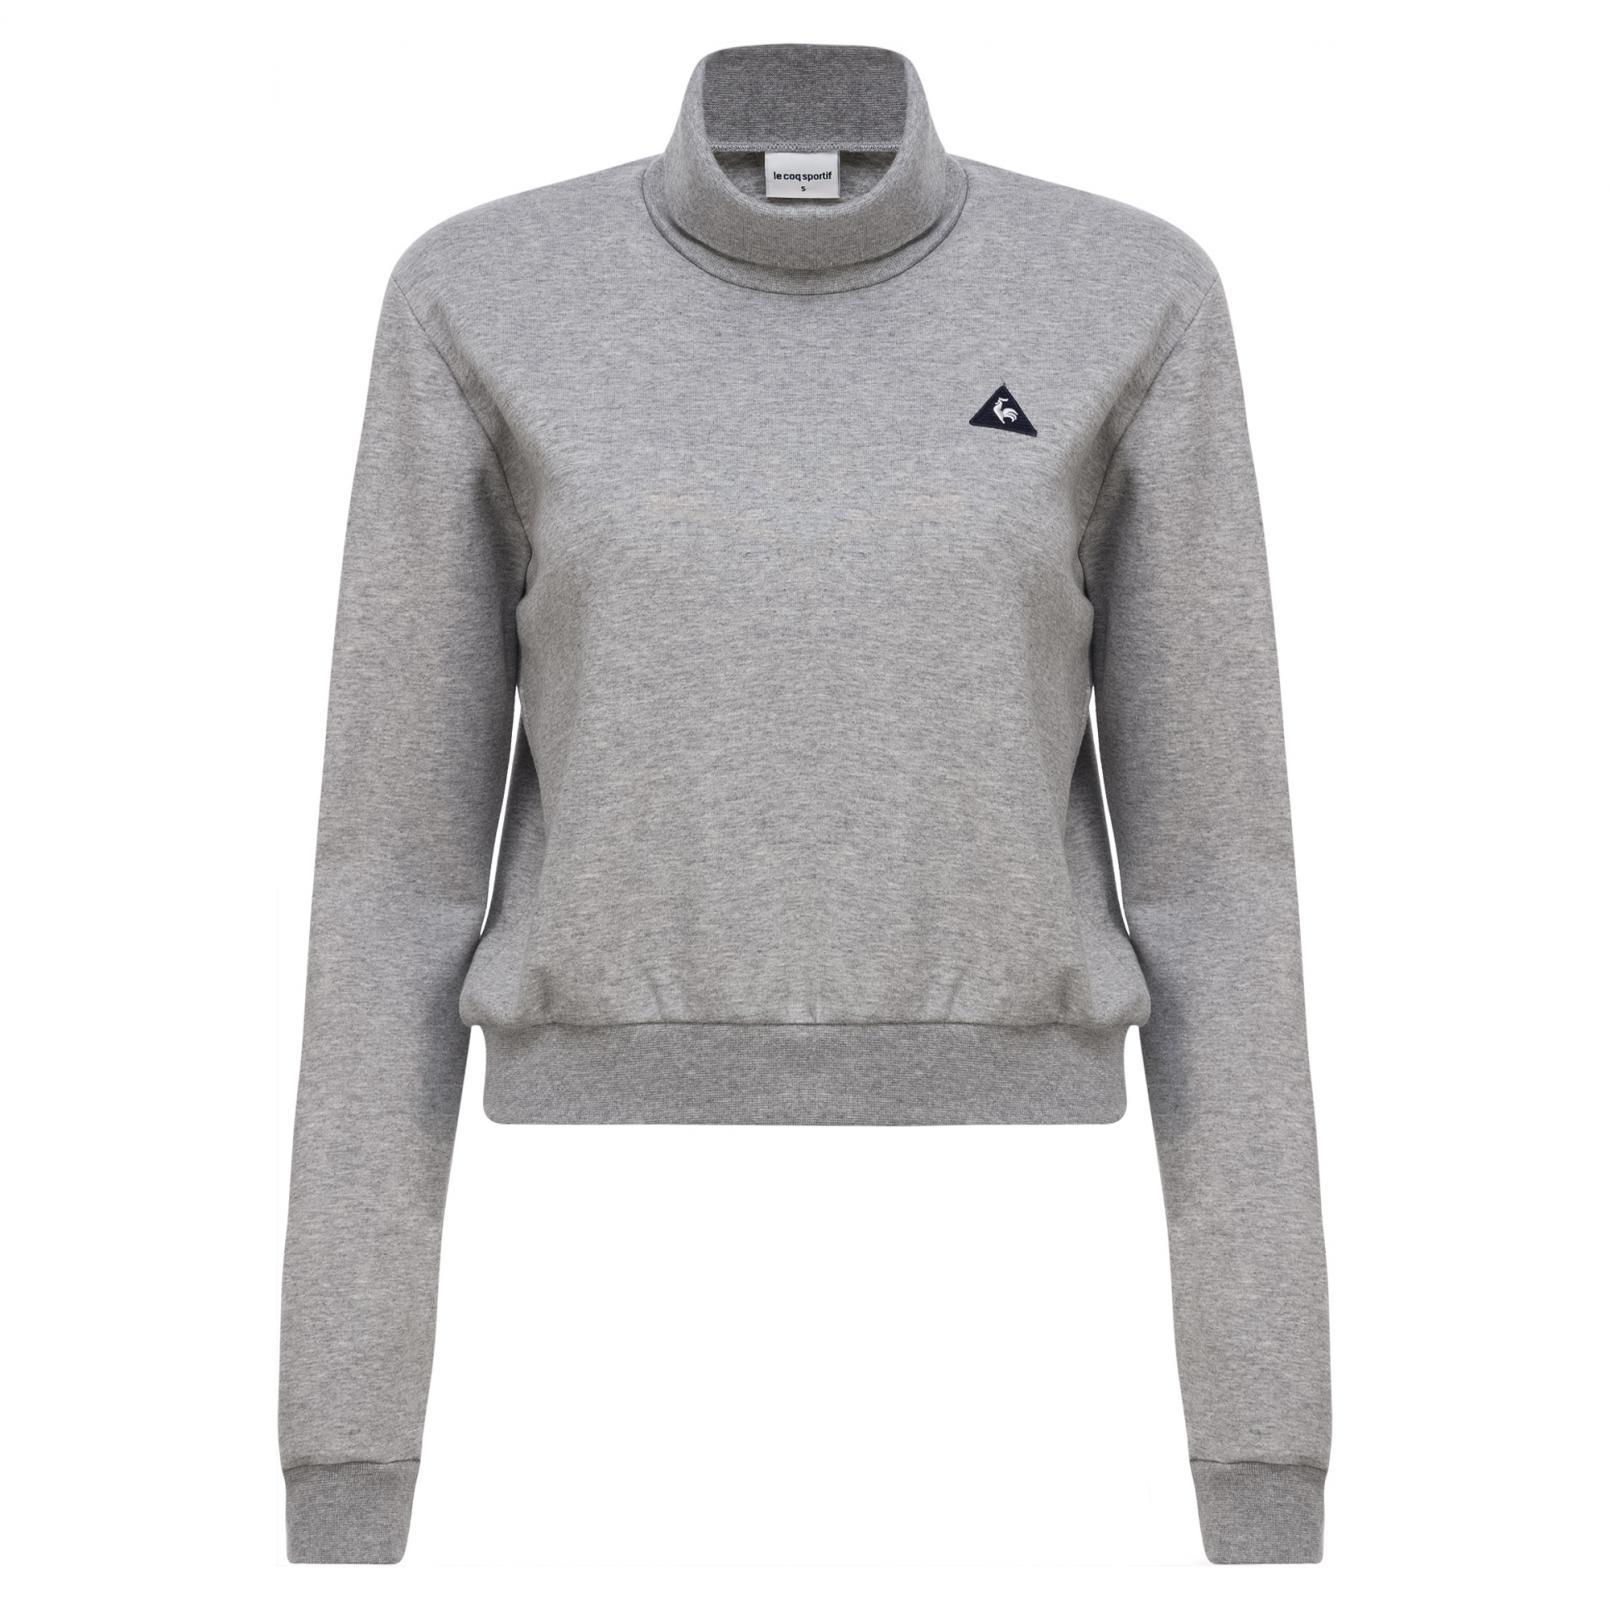 Sweatshirts & Hoodies – Le Coq Sportif Essentiels Crop Crew Sweat Grey